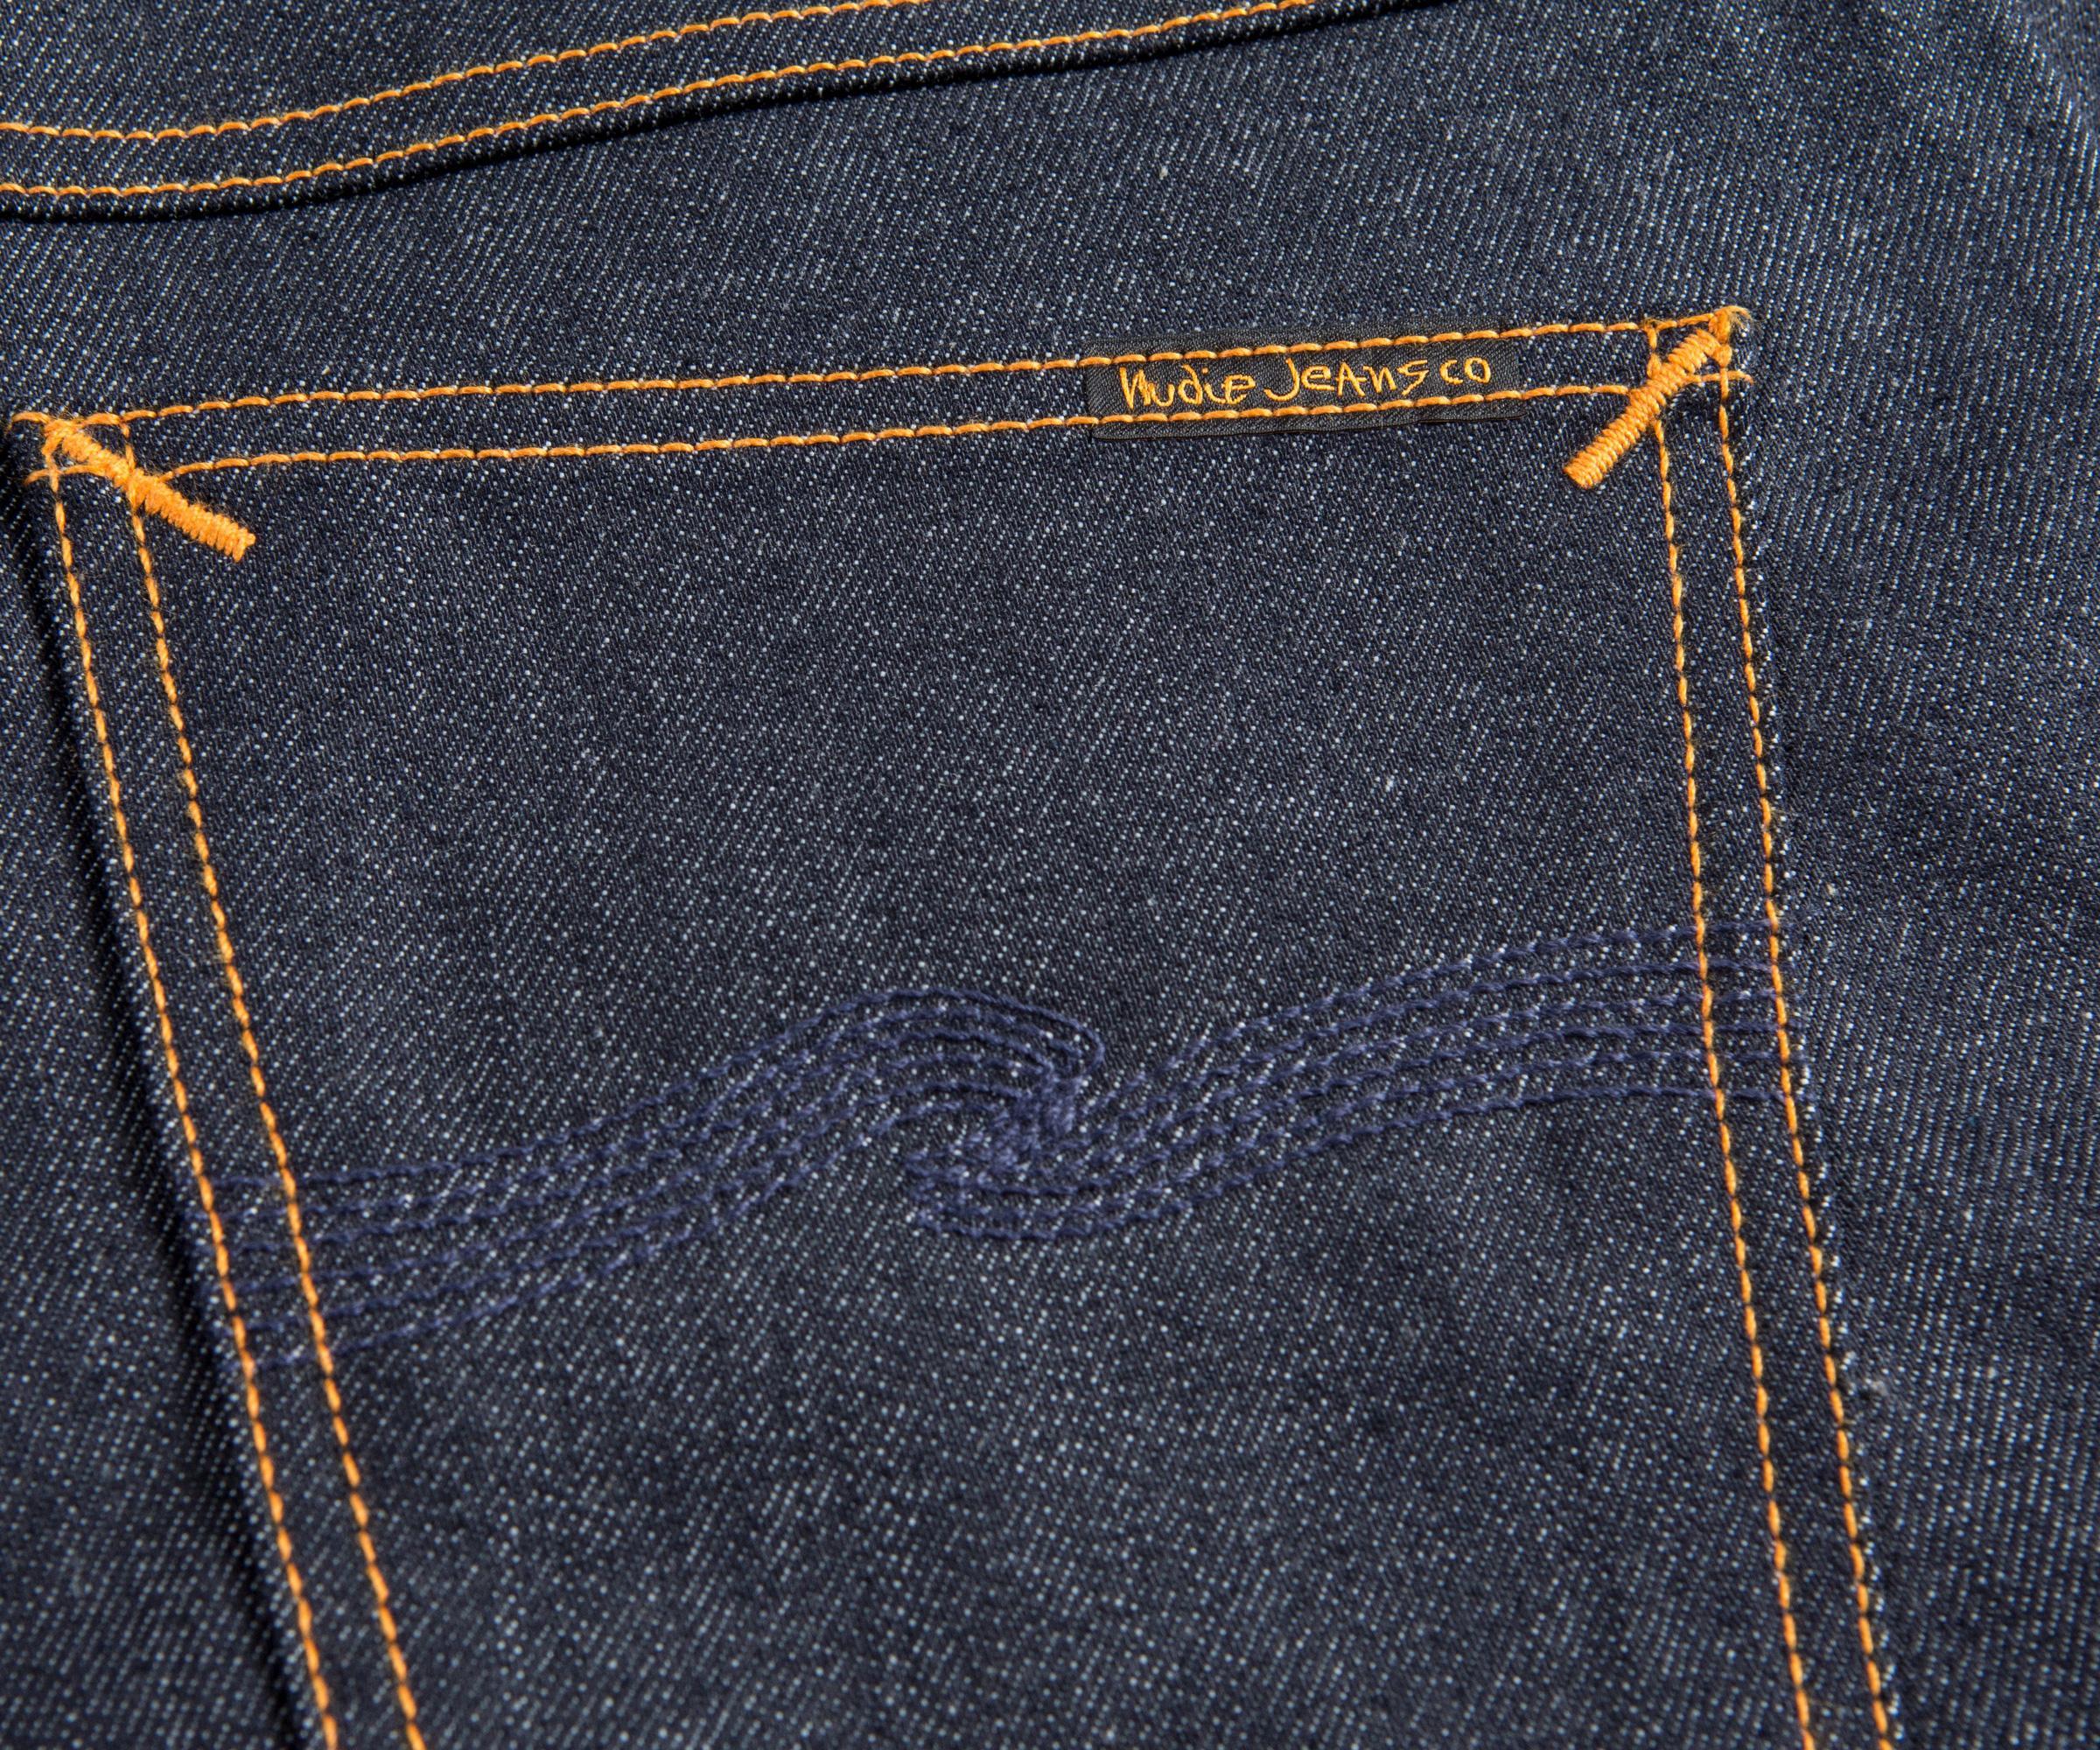 Nudie Jeans Denim 'brute Knut - Dry Navy Comfort' Jeans in Blue for Men